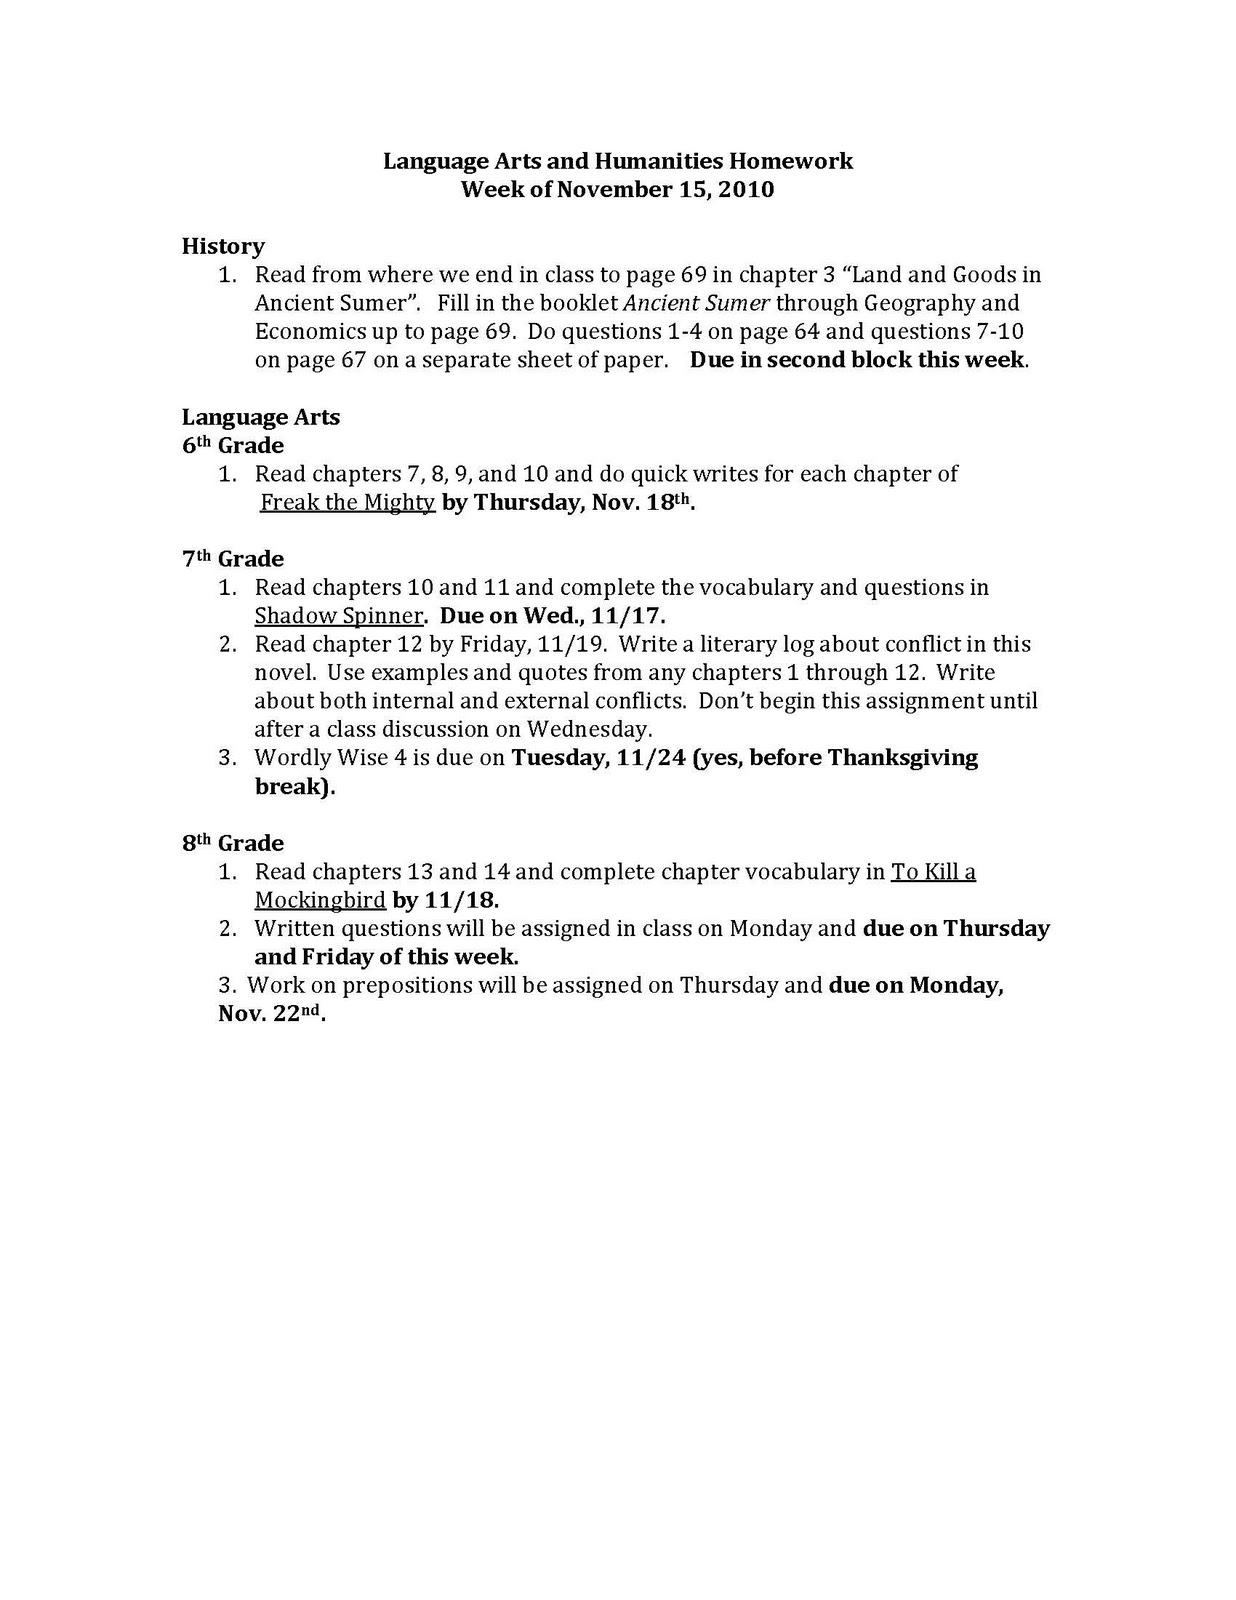 Research paper on tim burton